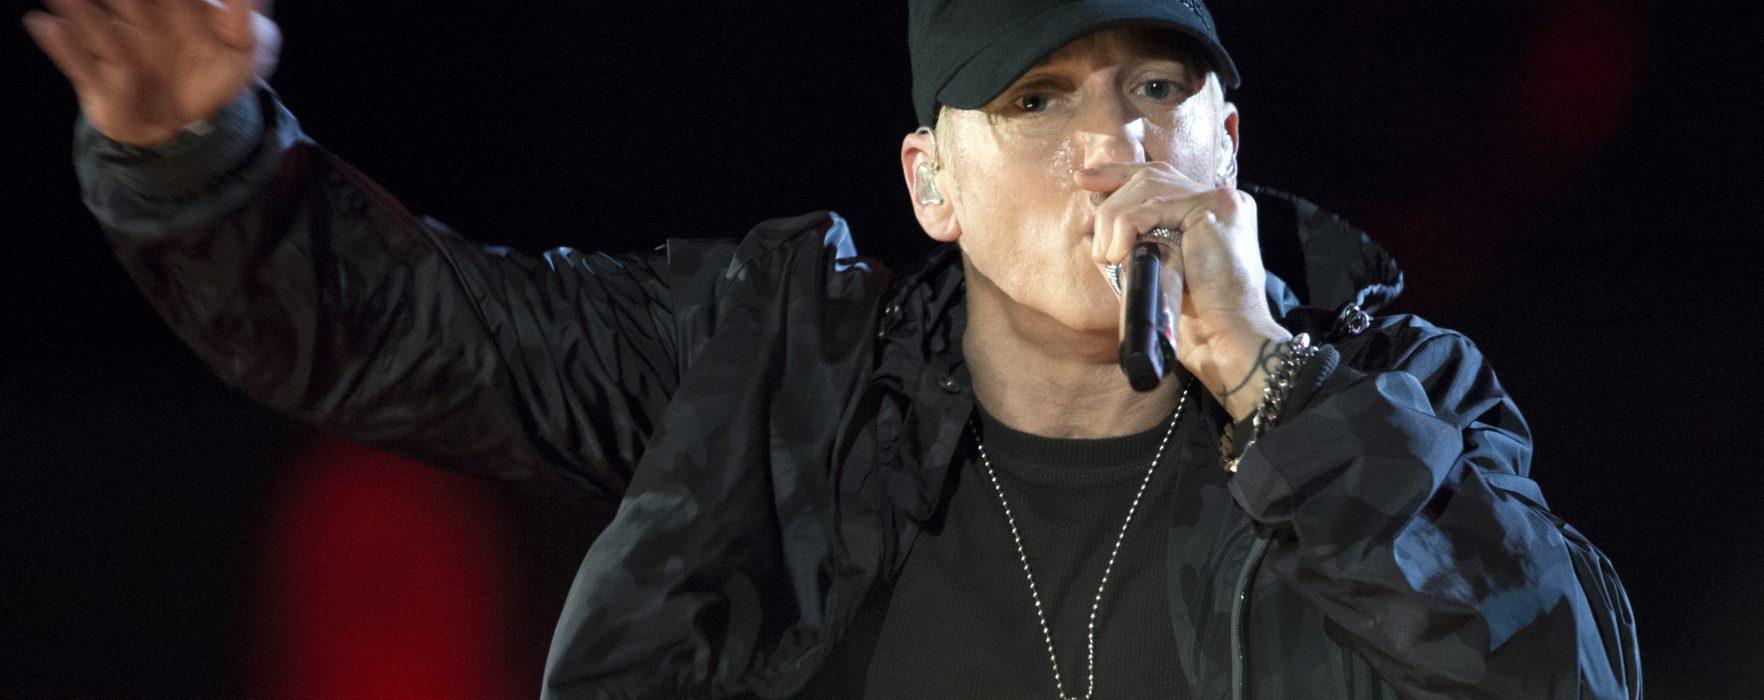 Eminem Teases New Album Ahead of Leeds Festival Return